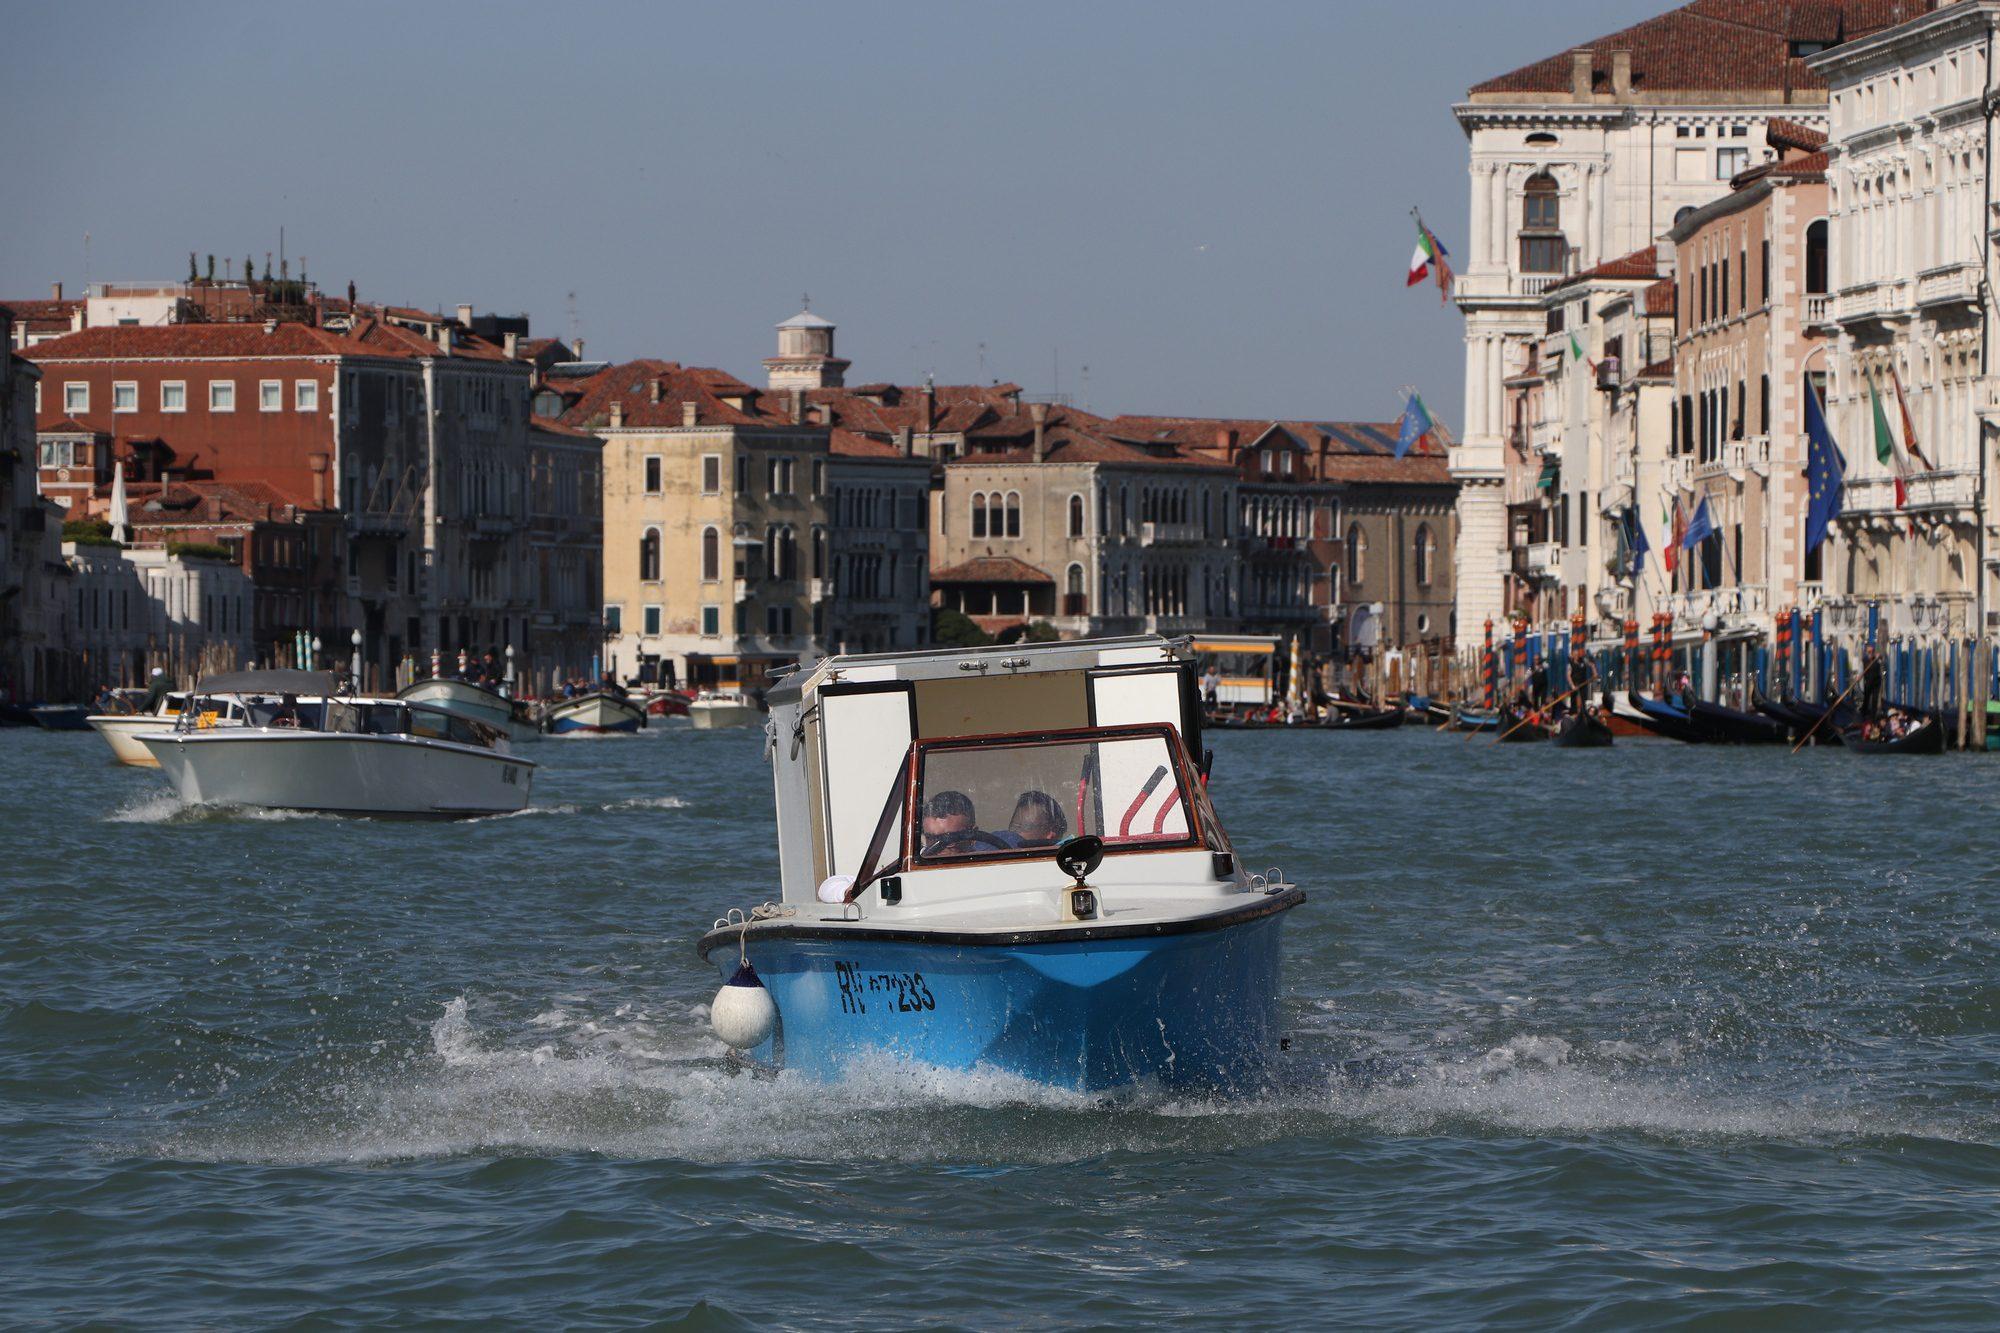 Boot auf dem Canale Grande in Venedig